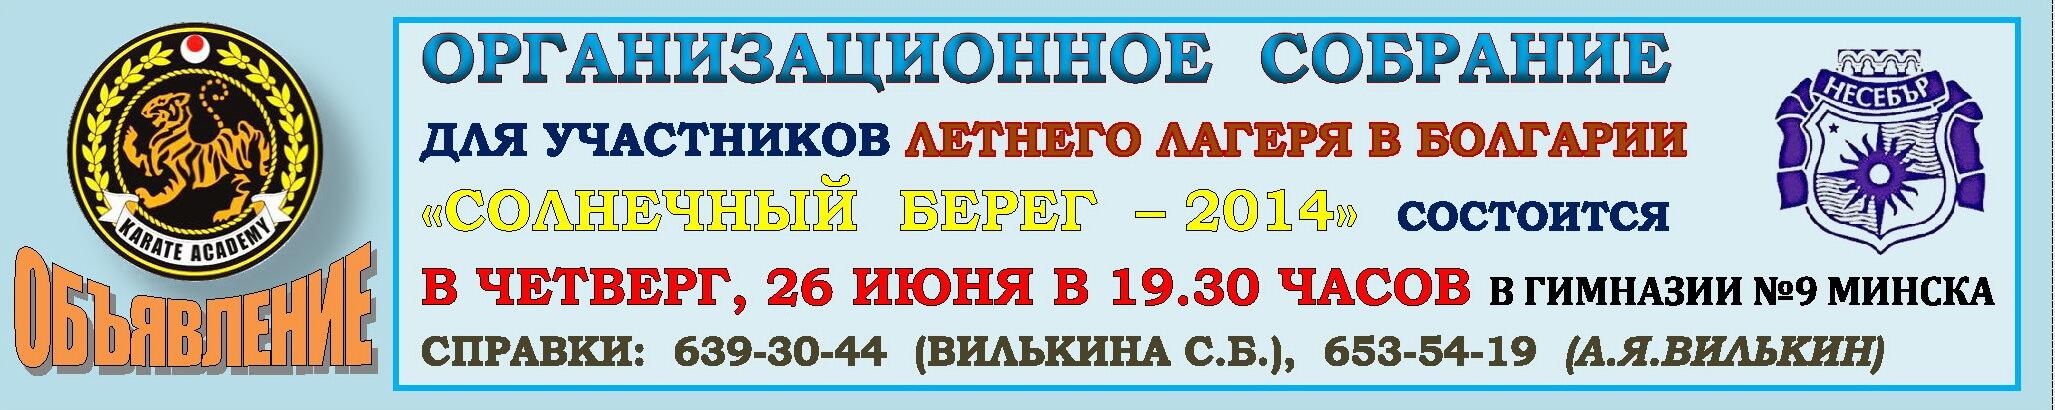 АК Собрание 2014-06-26